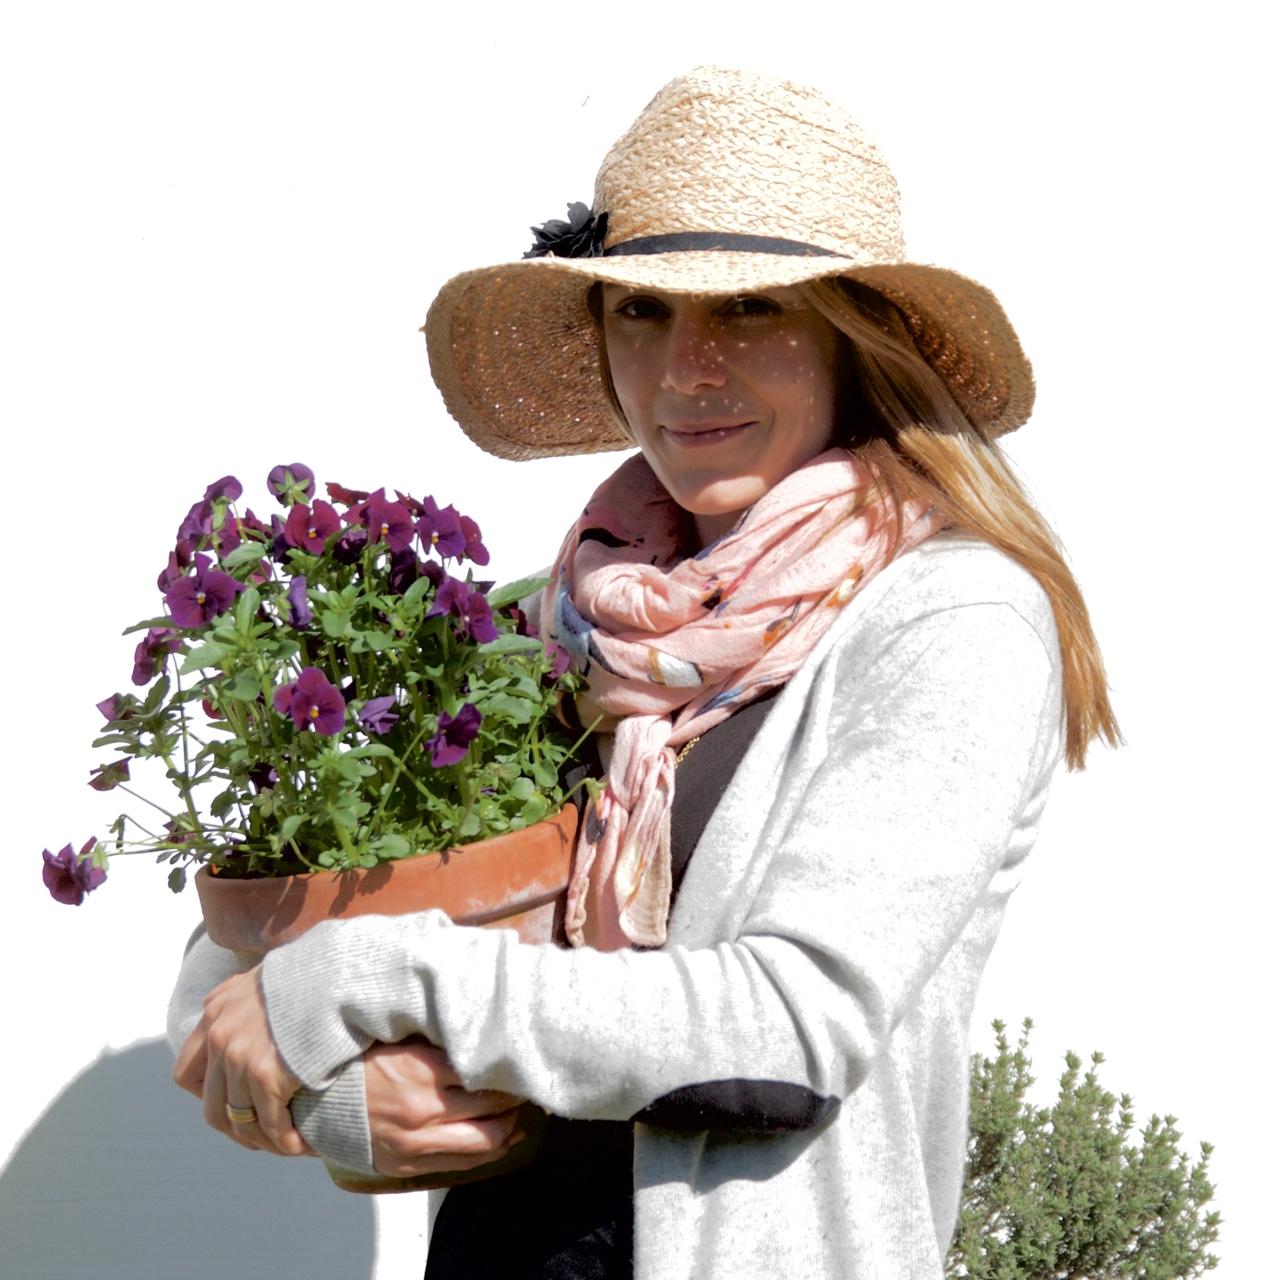 Anna Karlberg